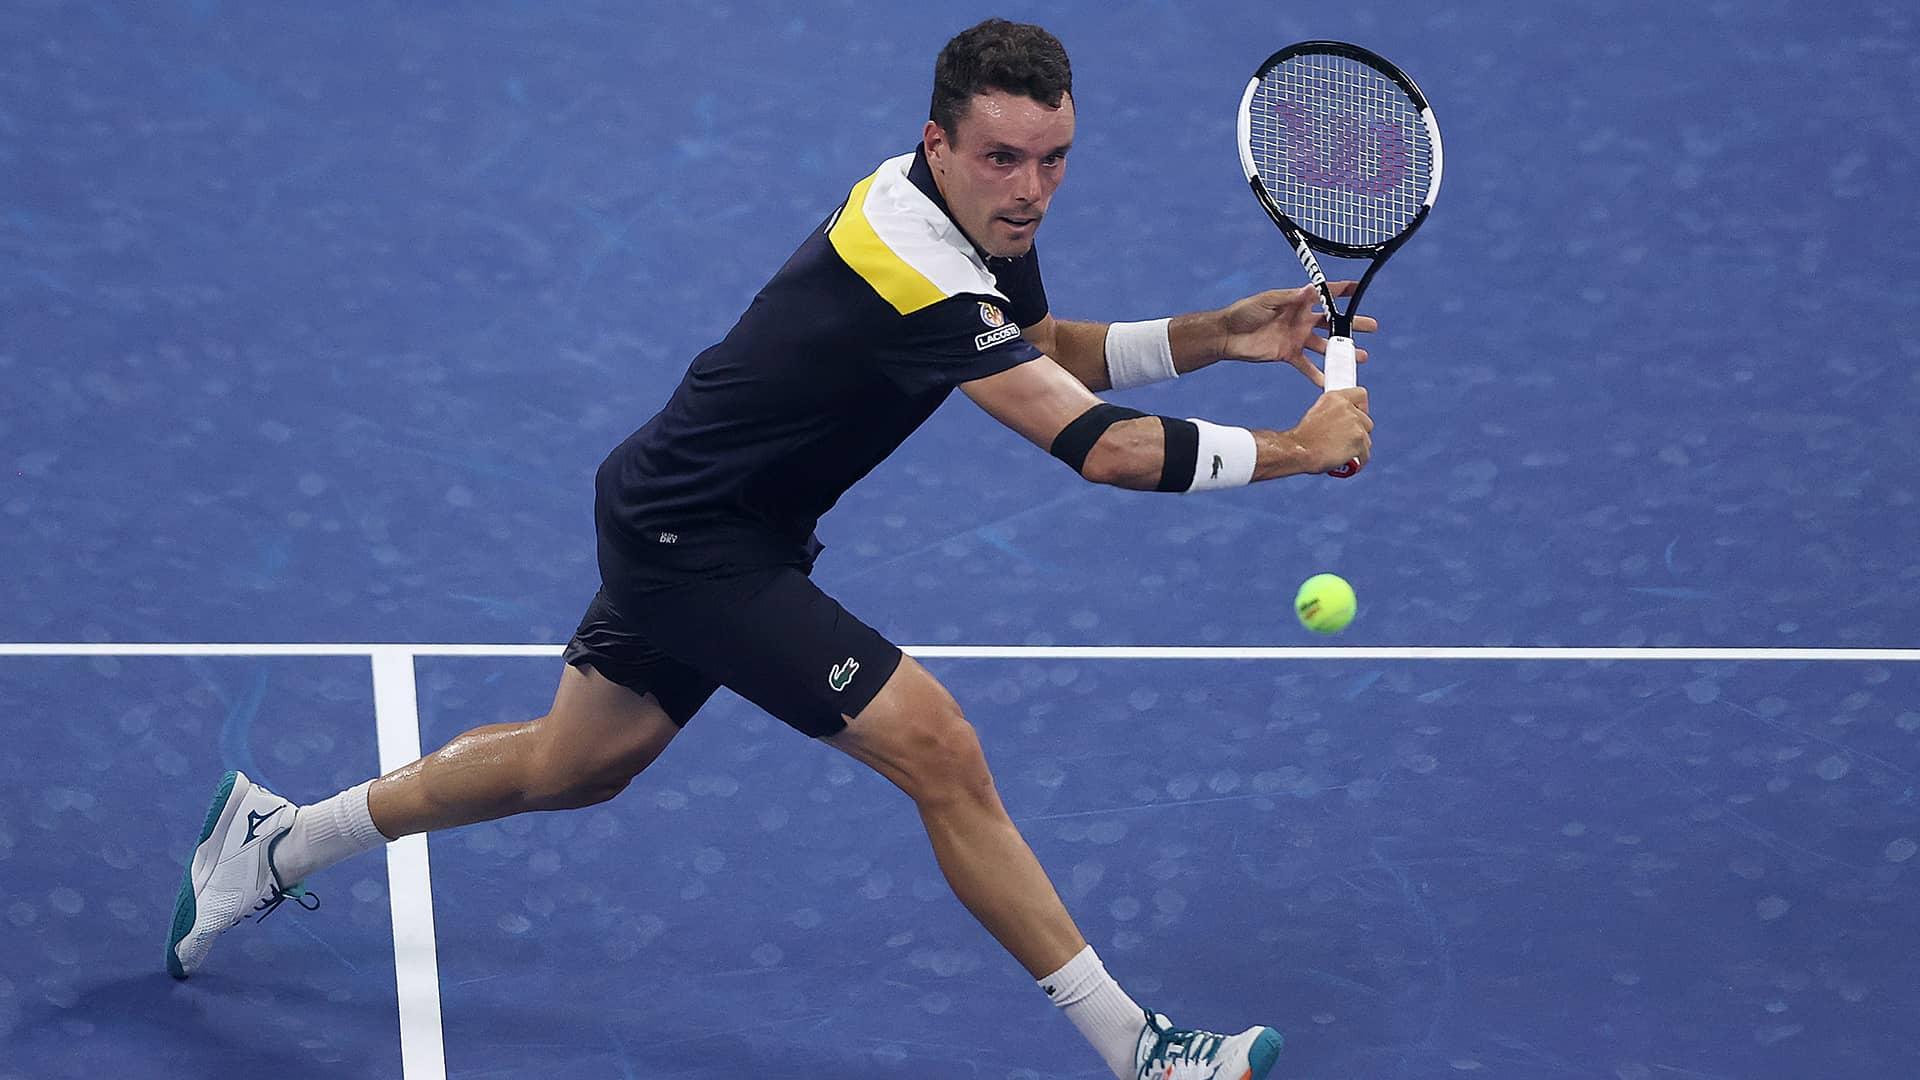 US Open 2021: Roberto Bautista Agut vs. Emil Ruusuvuori Tennis Pick and Prediction